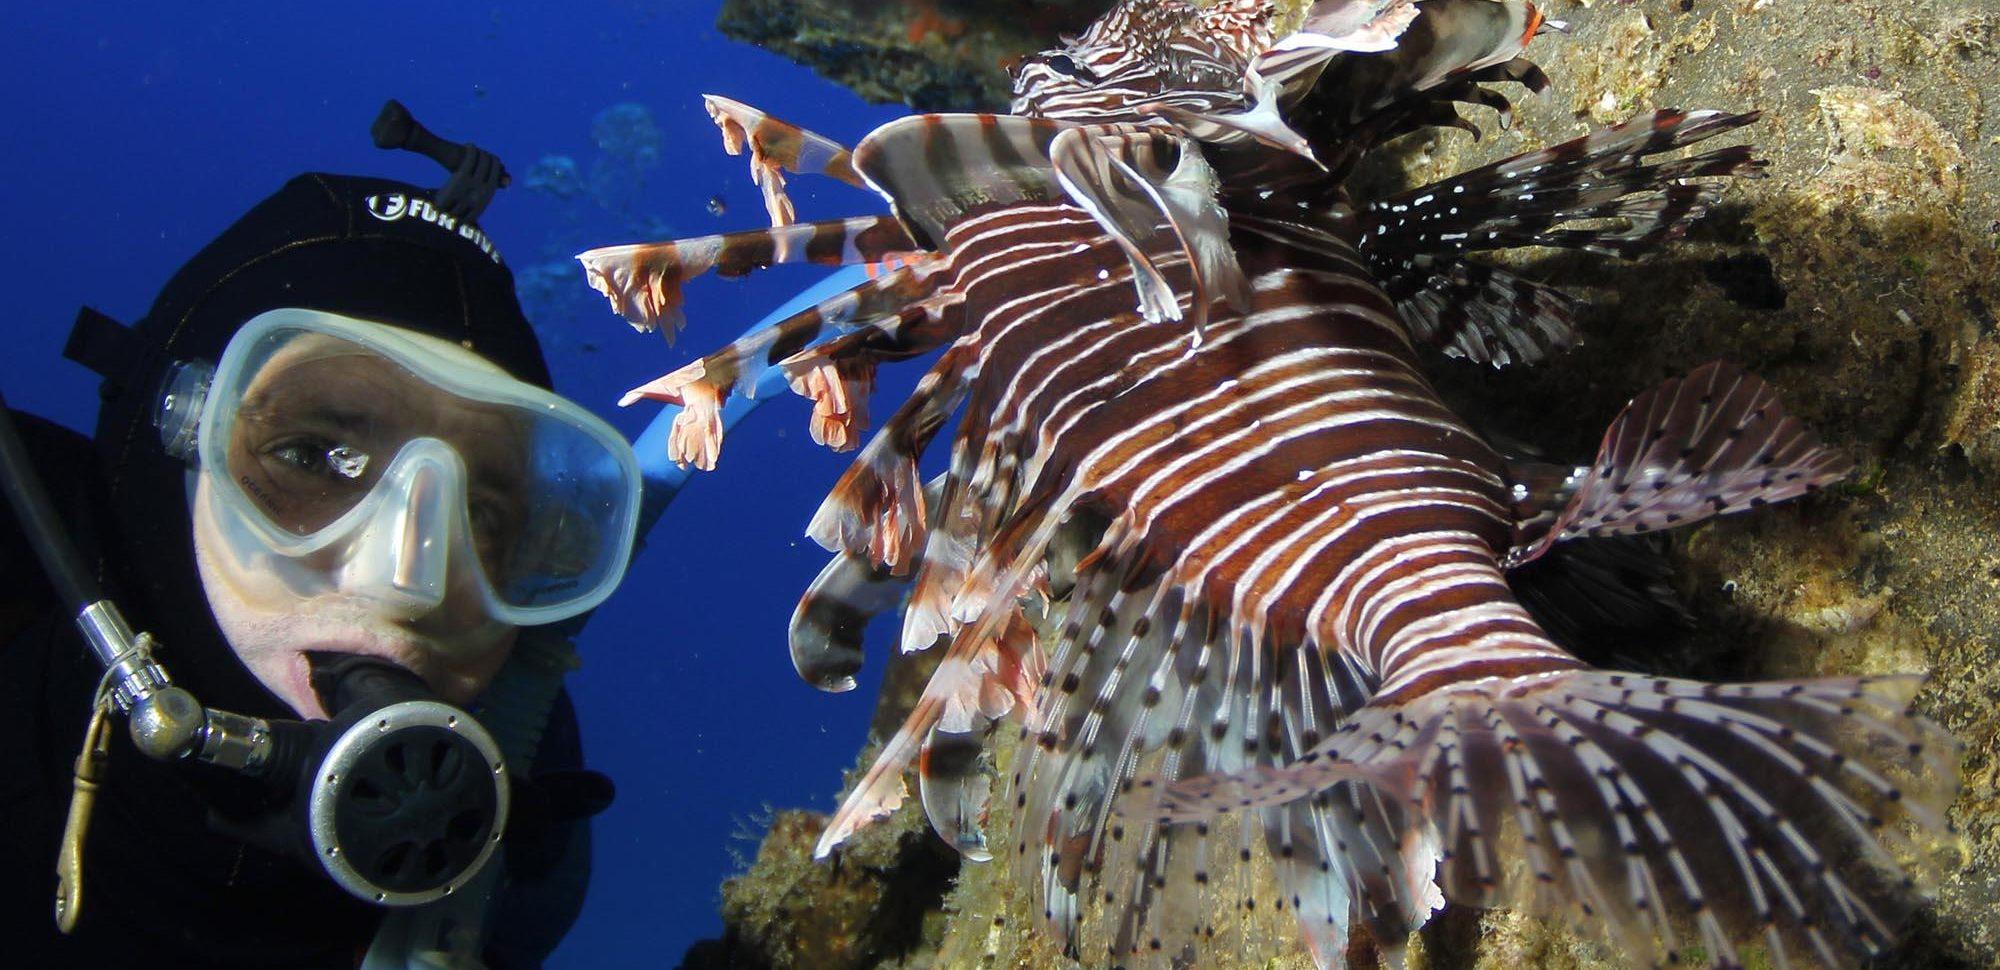 7 criaturas mais invasivas da Terra